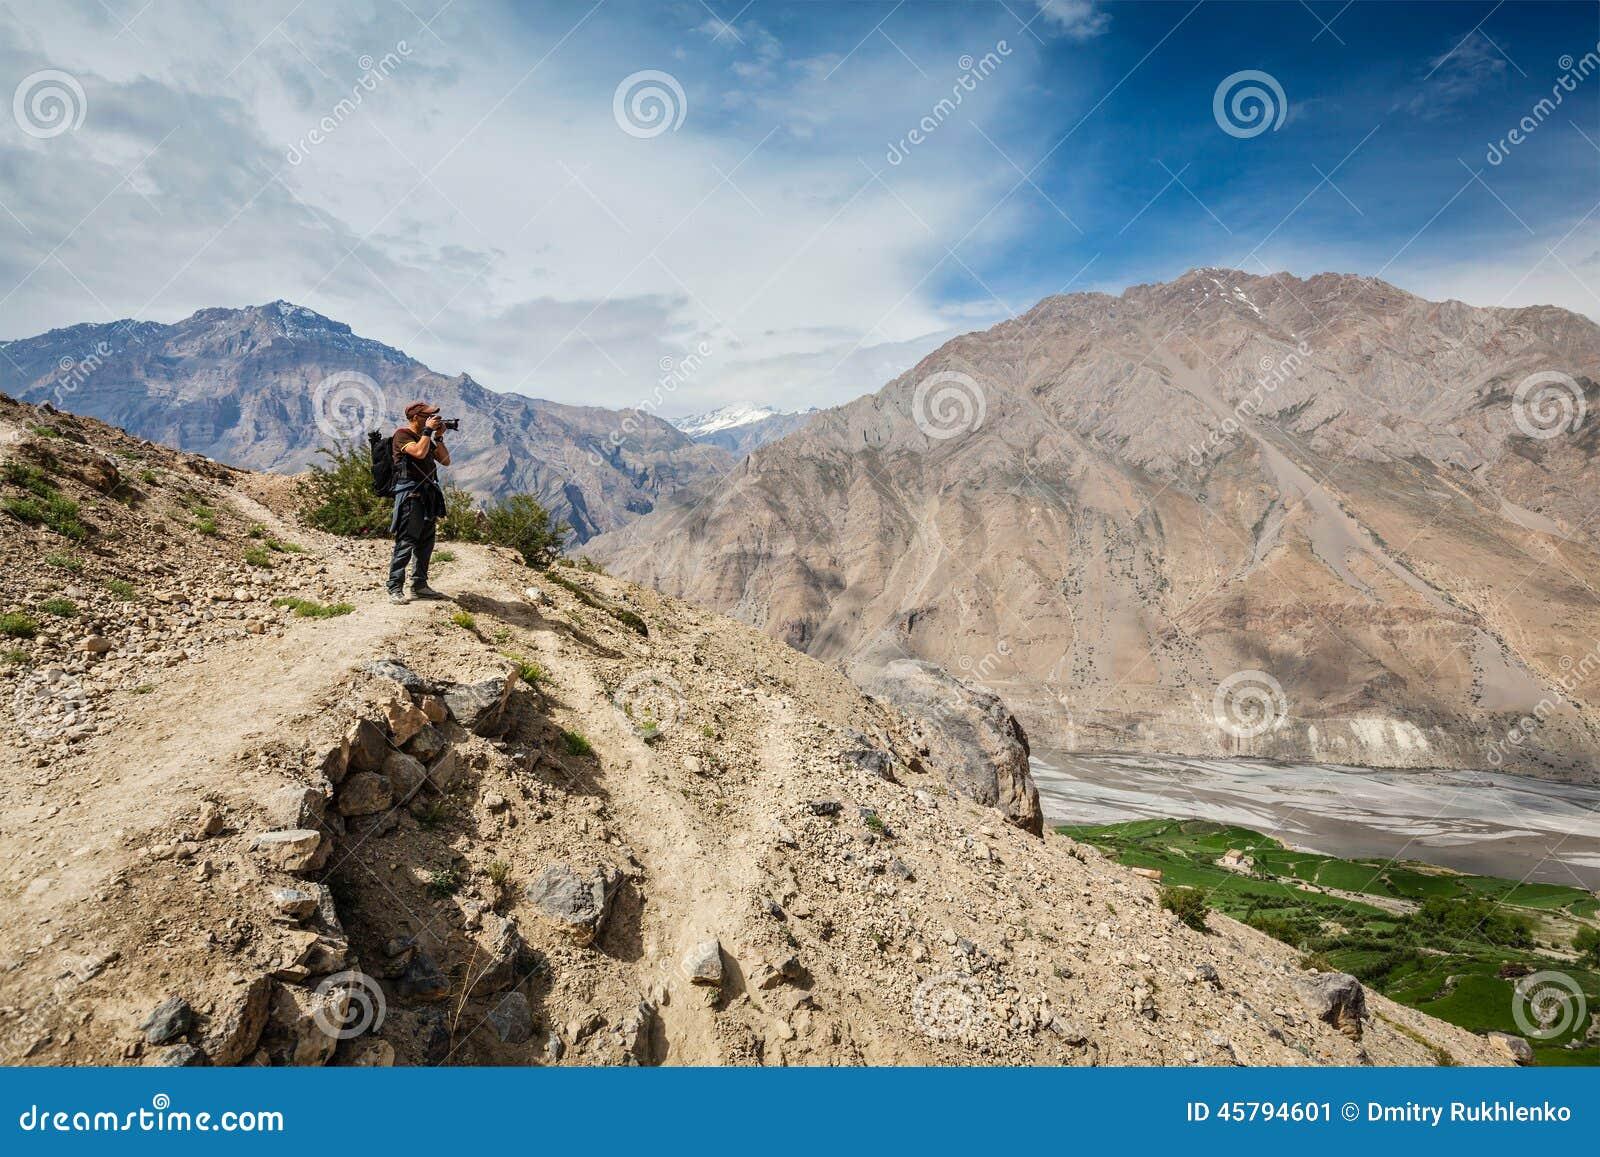 Photographer Taking Photos In Himalayas Royalty-Free Stock ...